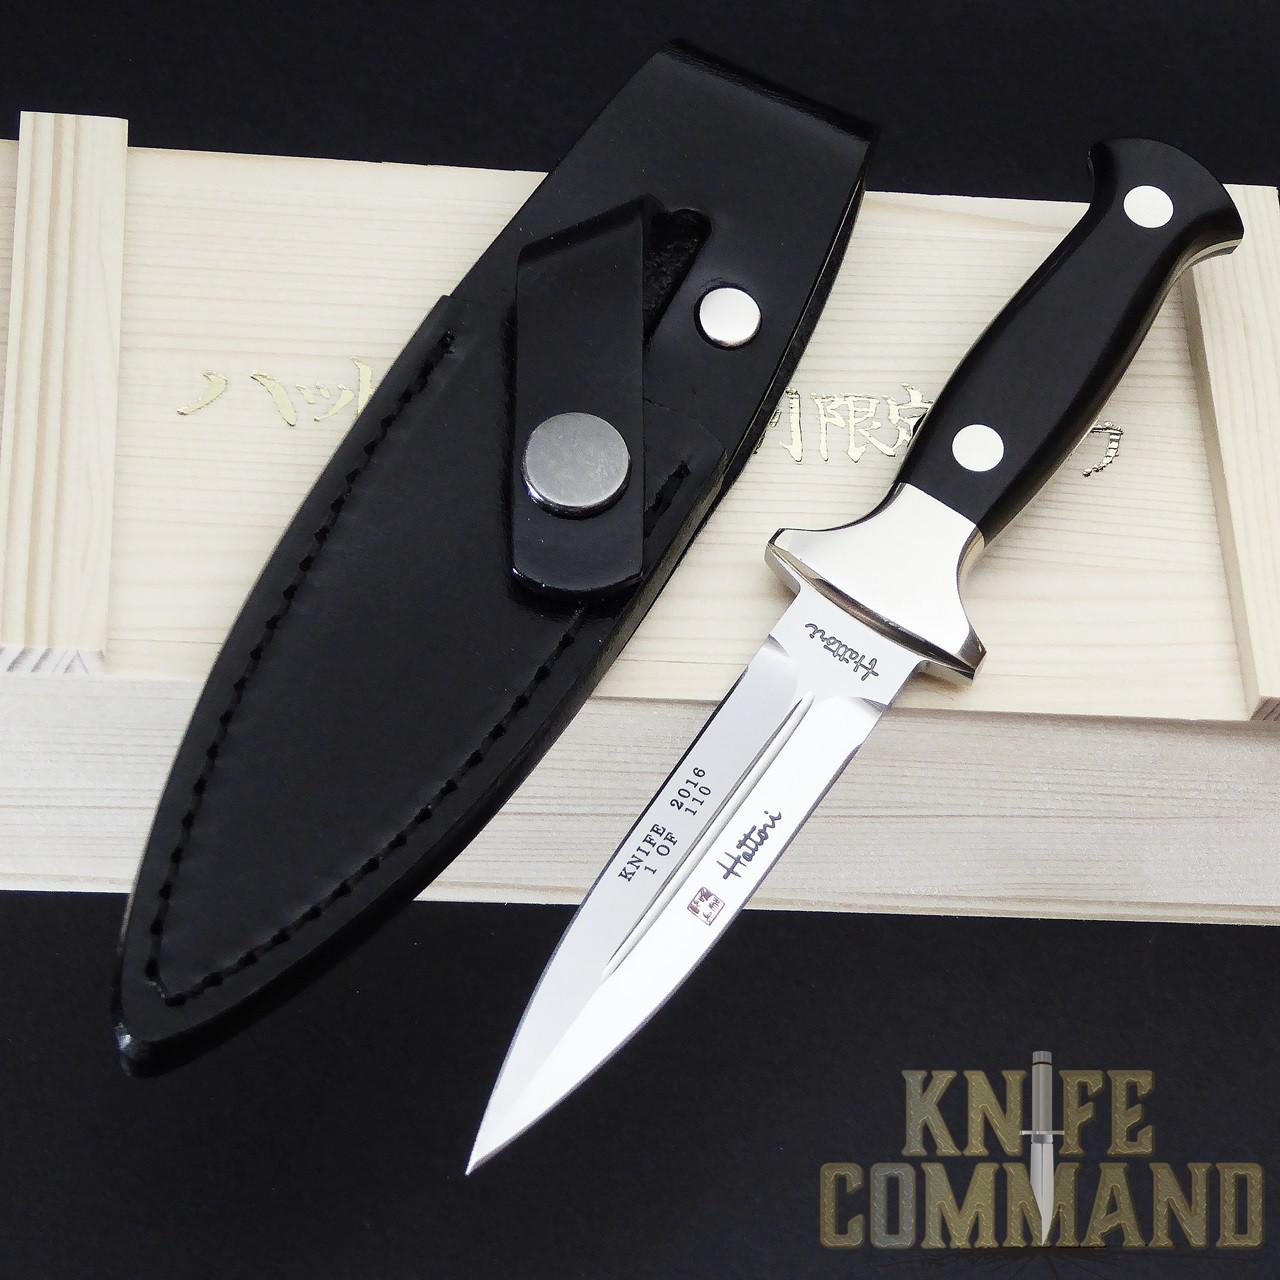 Hattori Knives Model 983A Dagger 2016 Knife of the Year.  Nice black belt sheath.